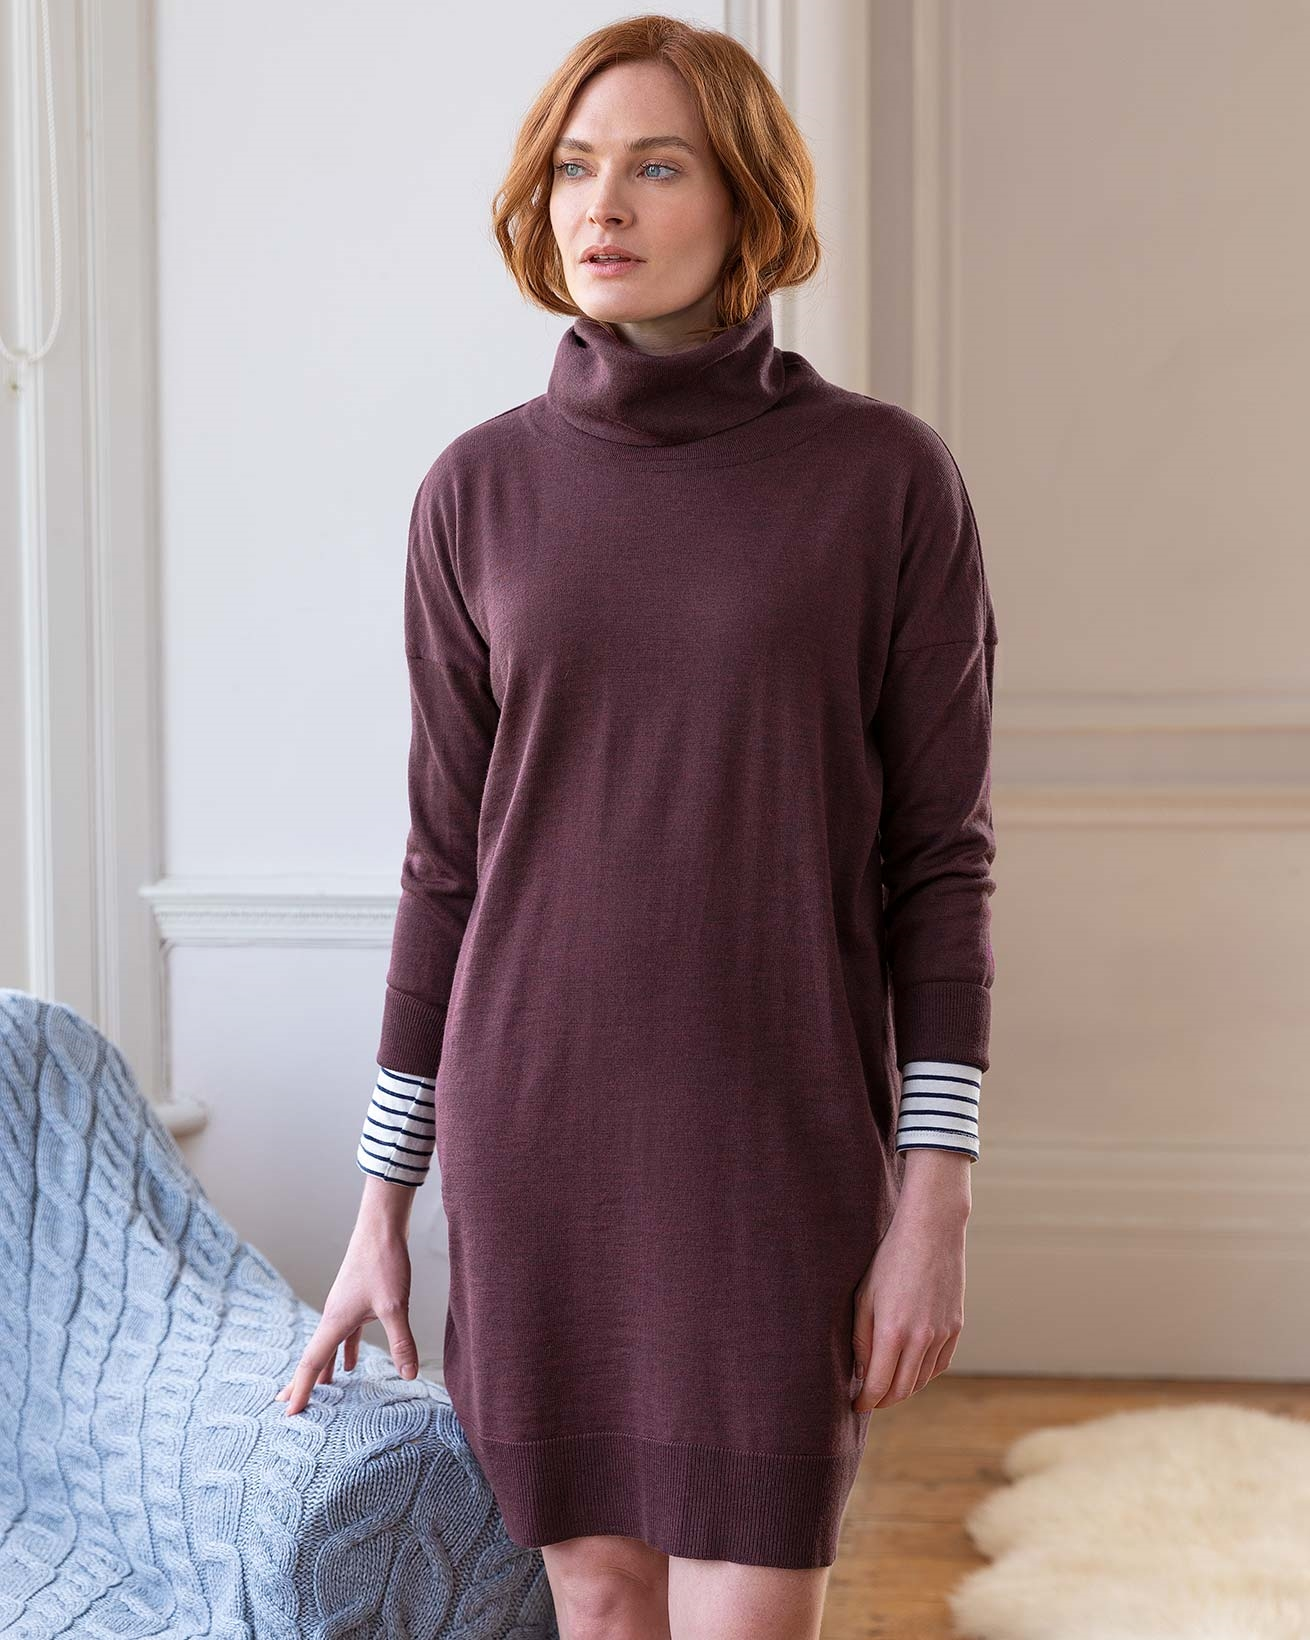 Slouchy Fine Knit Turtleneck Dress